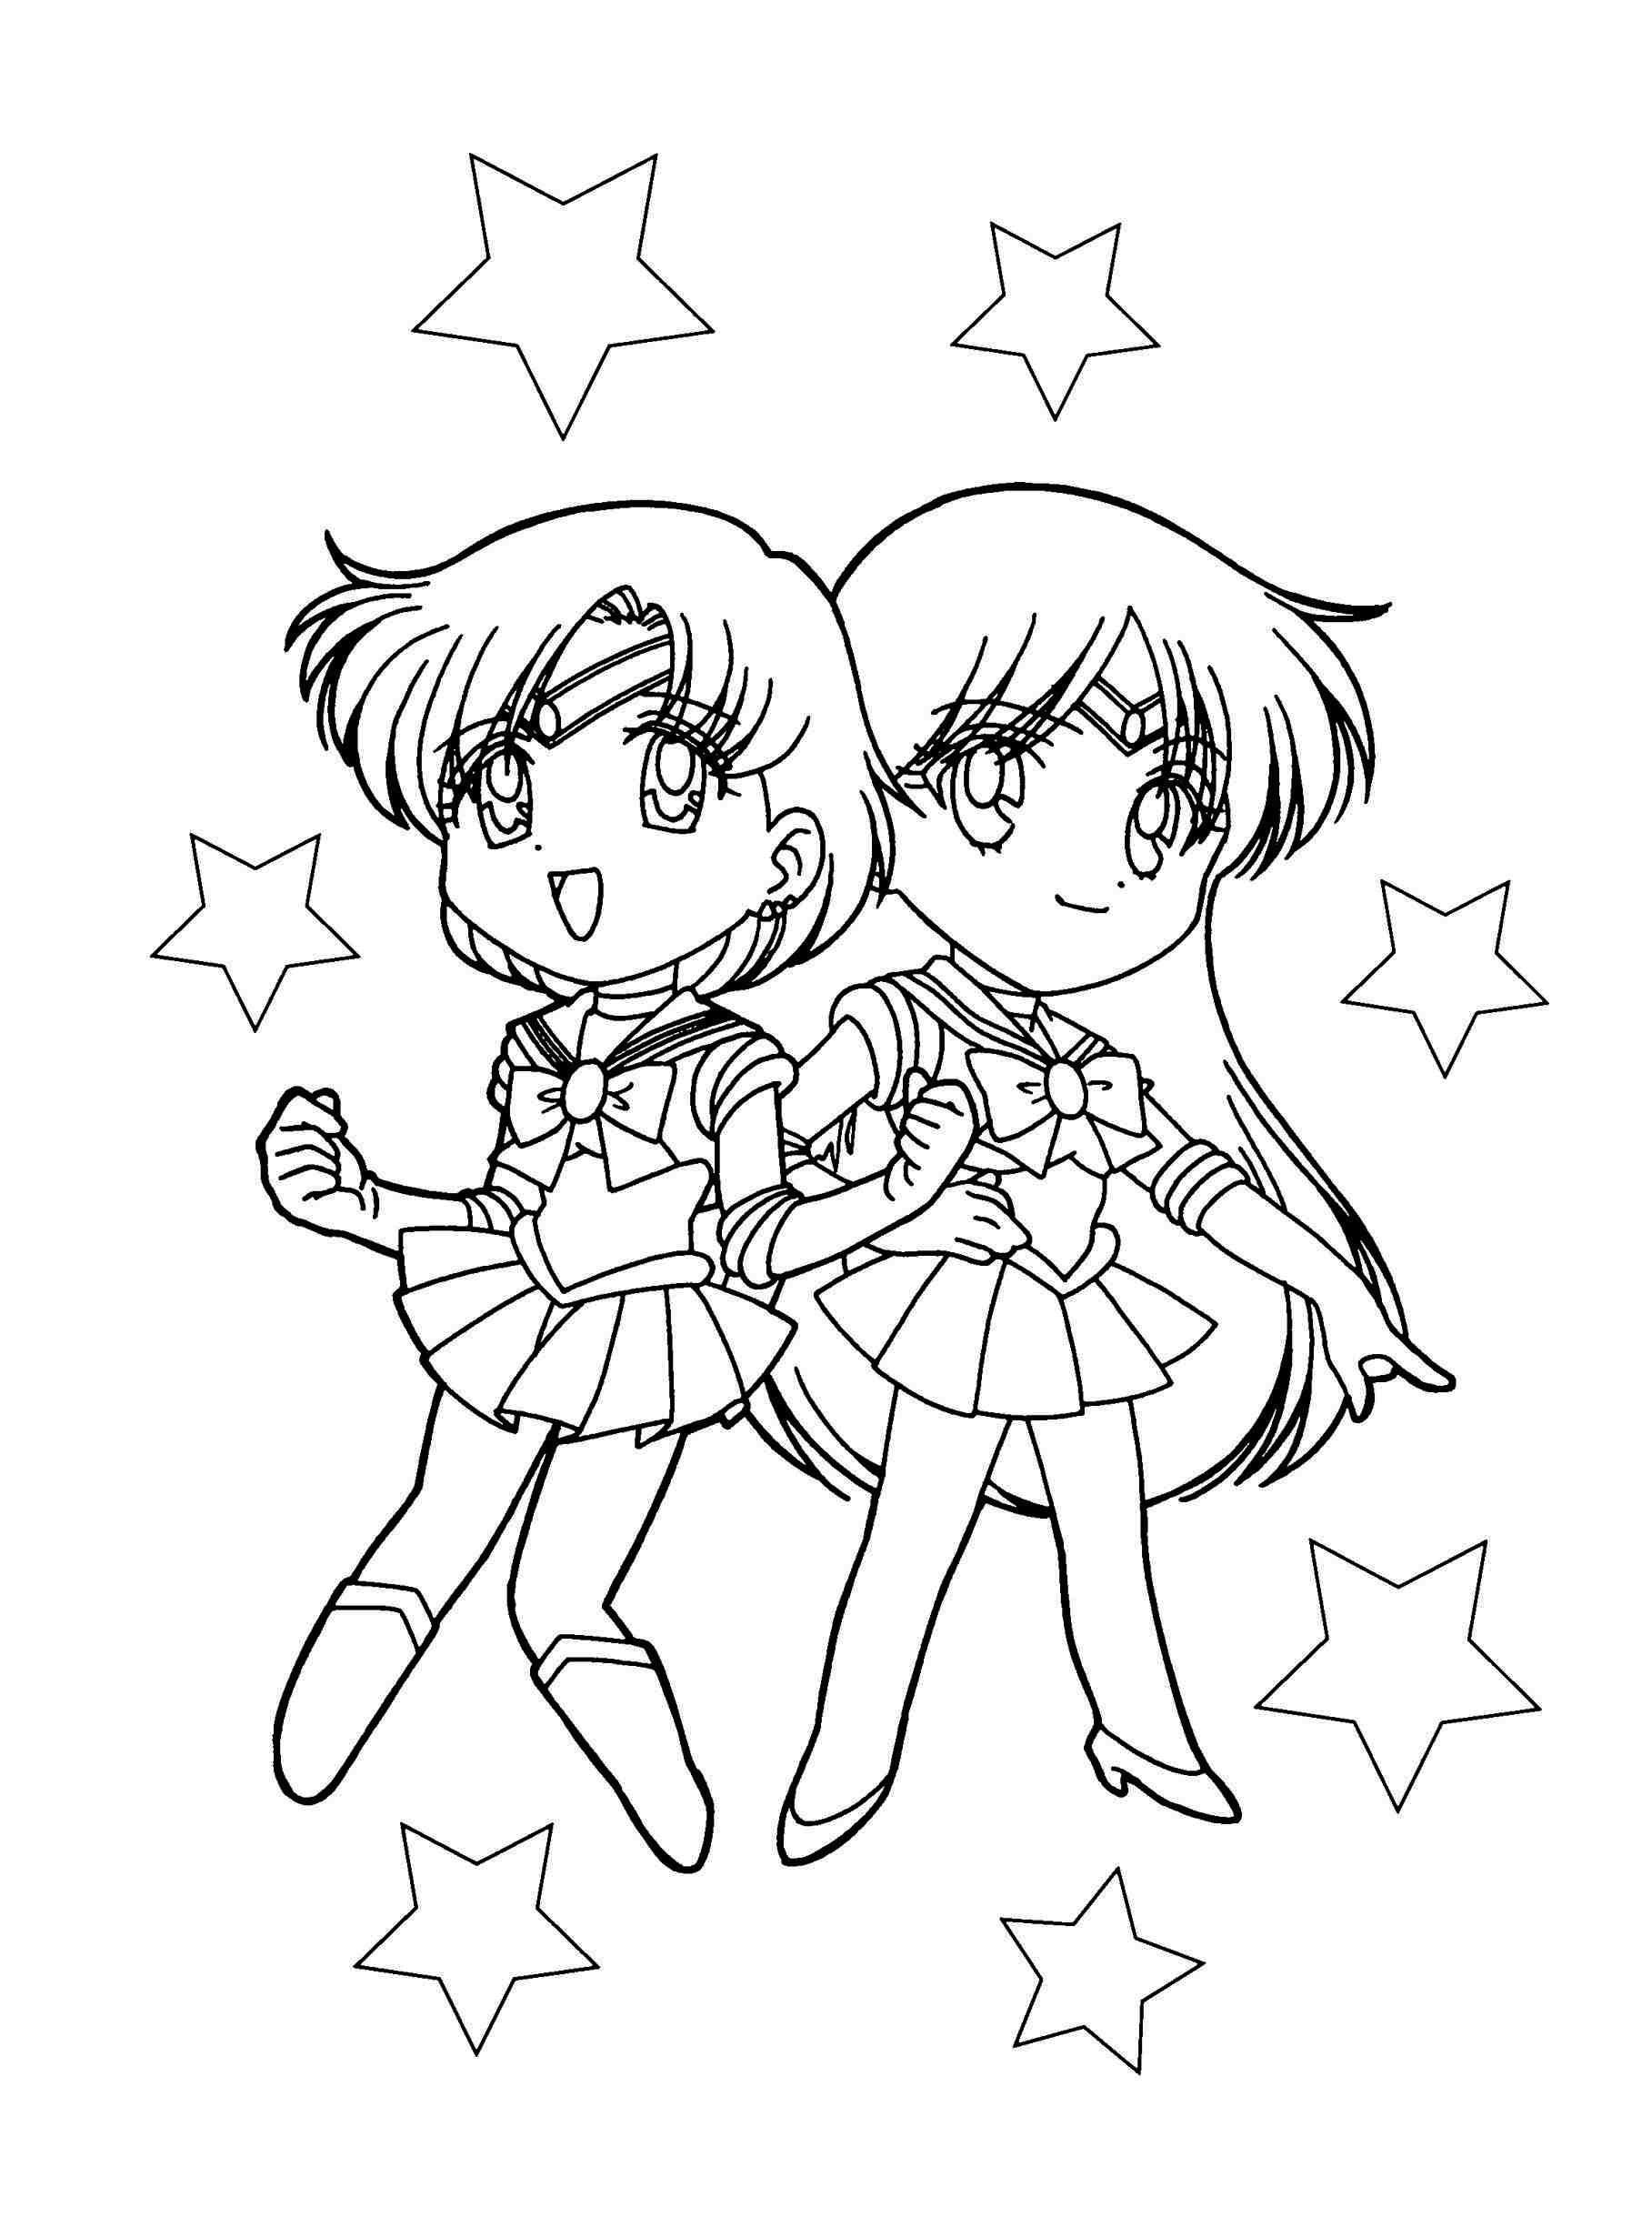 Chibi Sailor Mars Coloring Pages